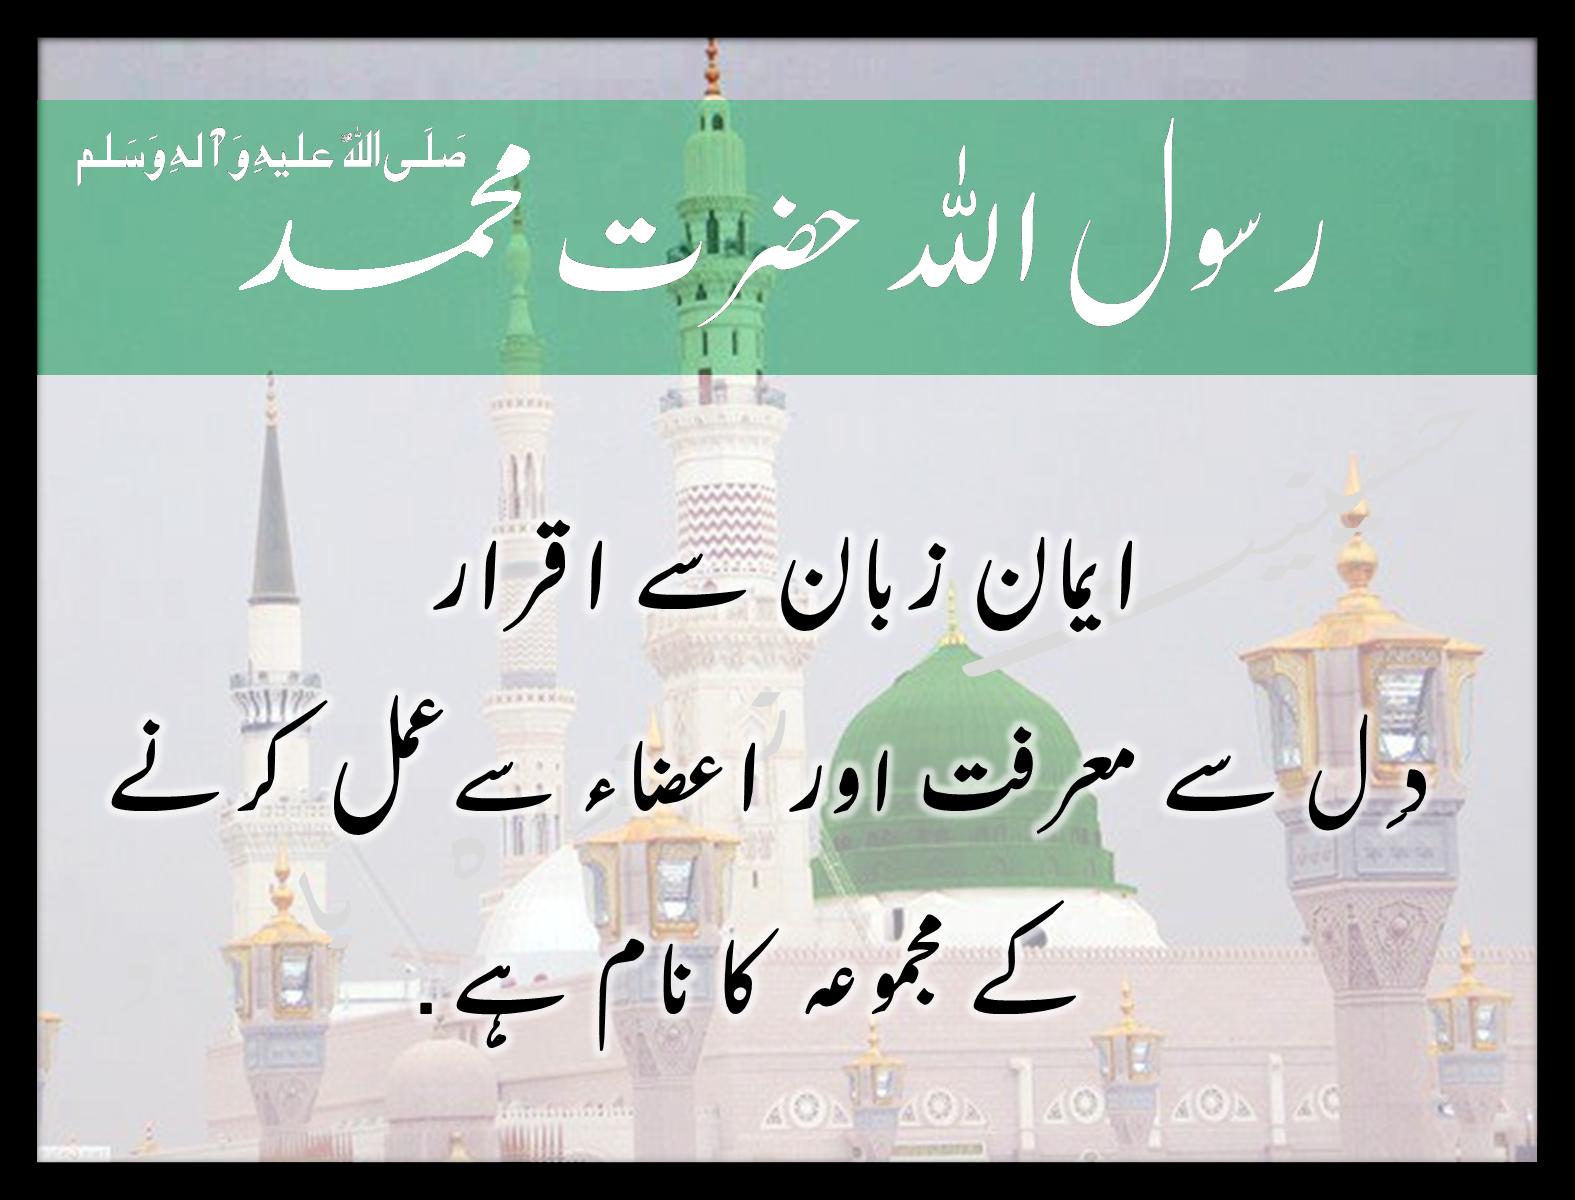 Hazrat Muhammad Saww